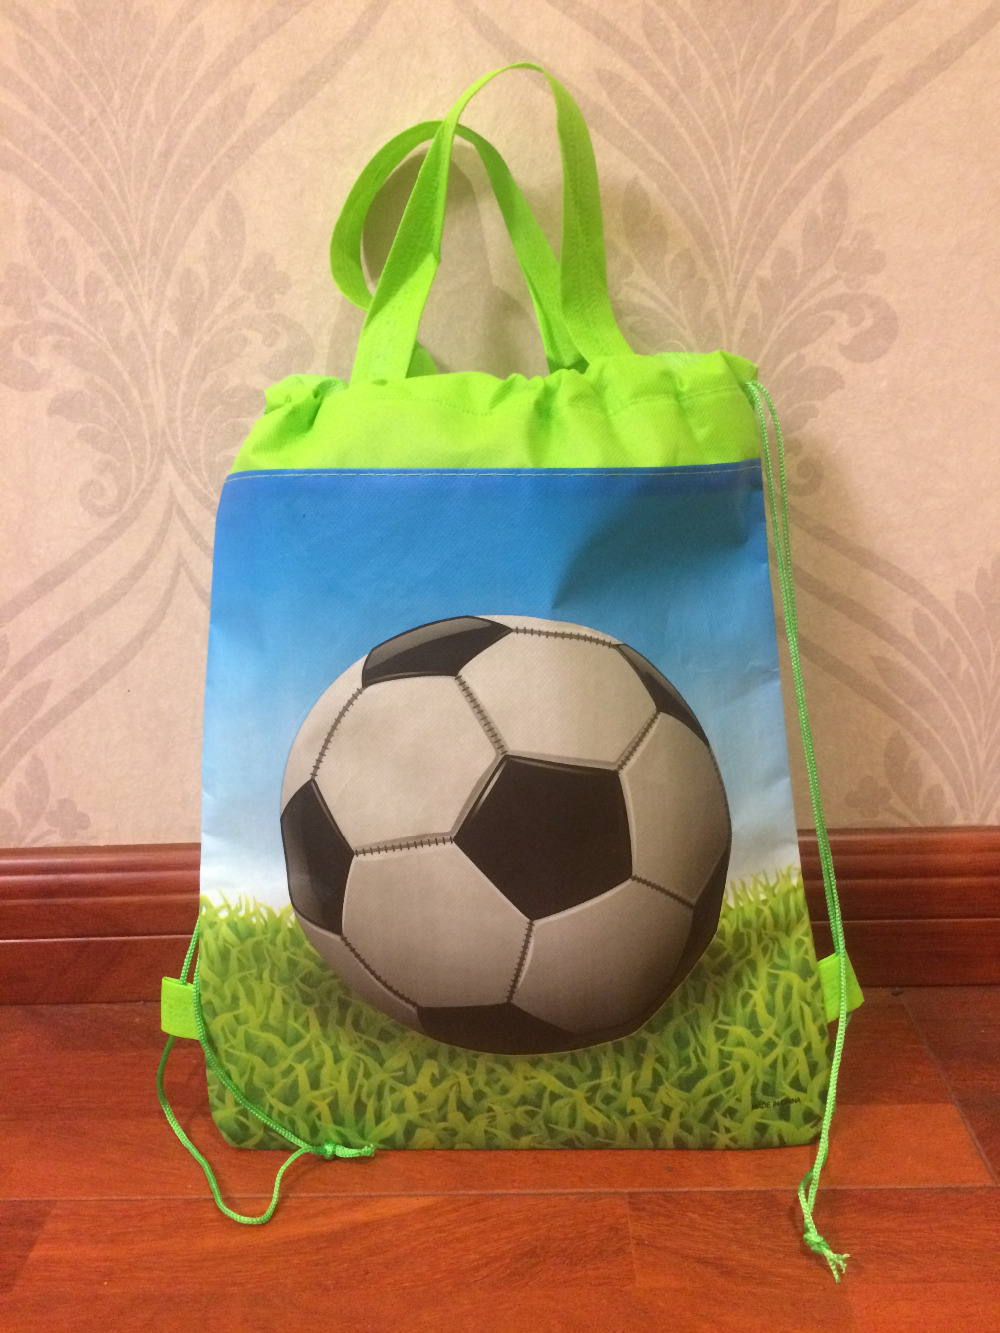 childrens  backpack footballl  Backpack School Bag for runner , waterproof  shoe bag for kids gift birthday gift stuff supplies